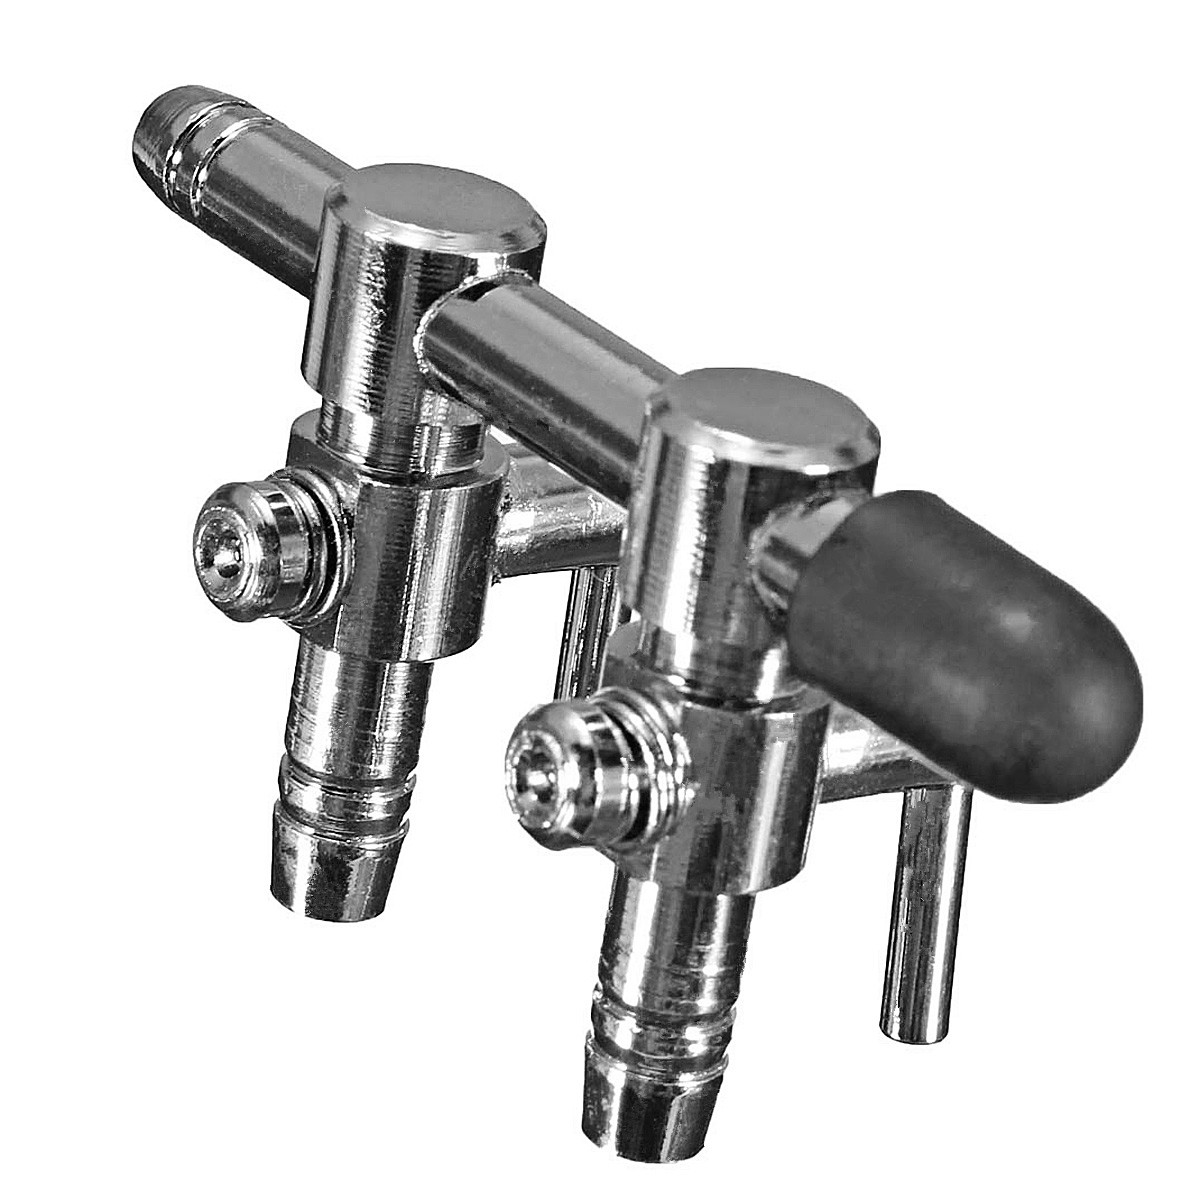 New Aquarium Tank Air Pump Air Flow Tube Pipe Line Stainless Steel Control Valve